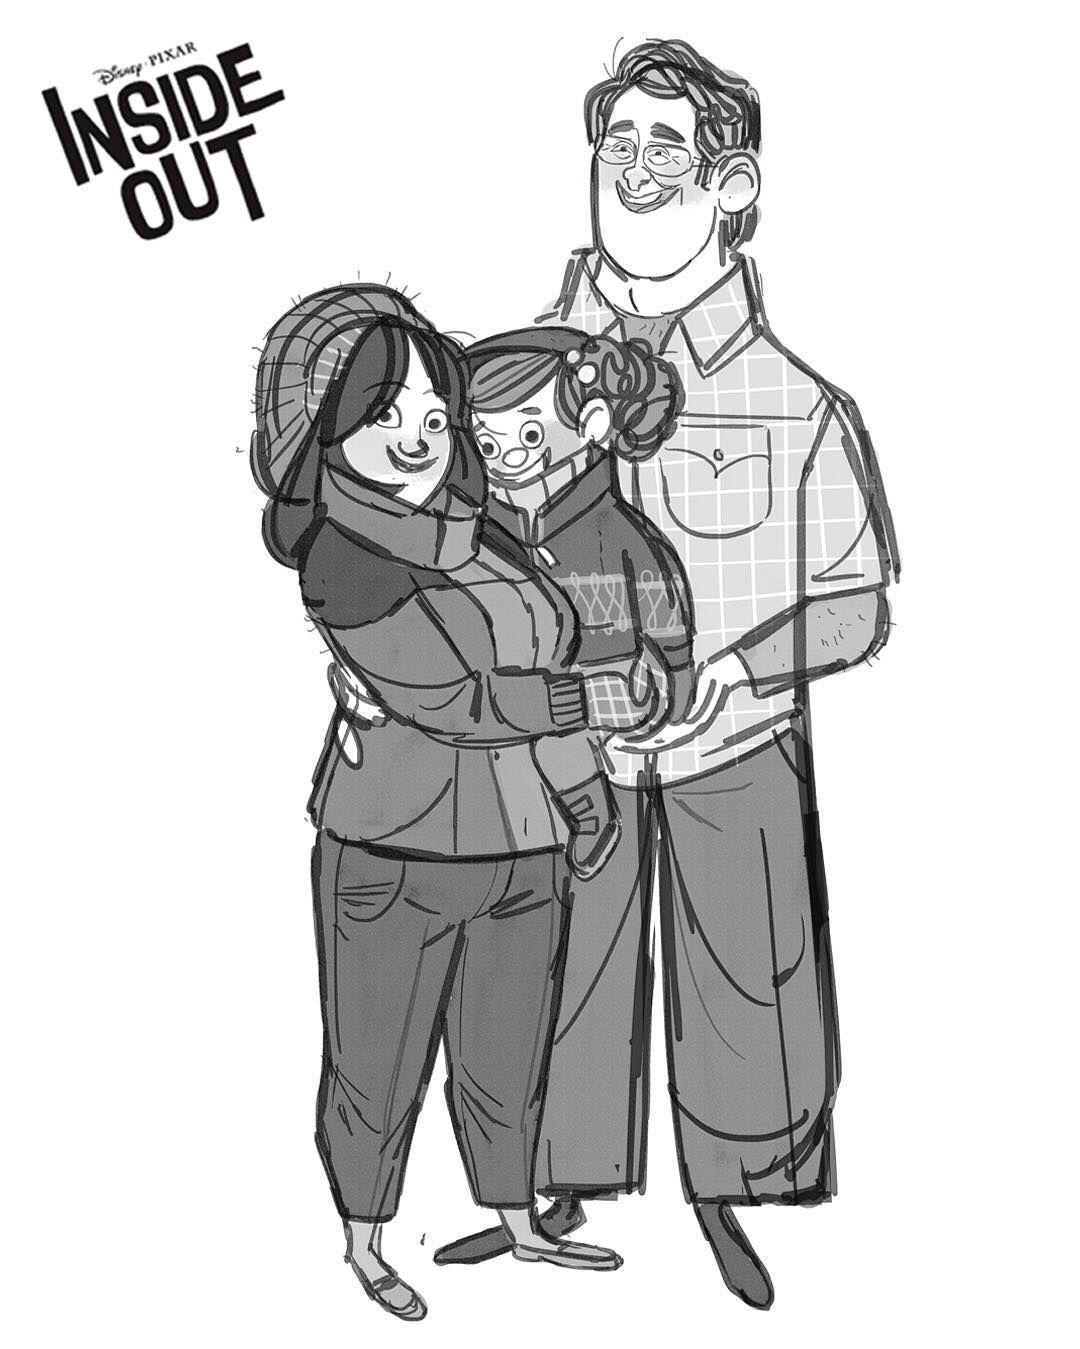 Family portrait! #happyeaster #minnesota #family #together #love #pixar #insideout #animation #film #characterdesign #sketchartist #design #art #illustration #concept #womeninanimation (at Pixar)